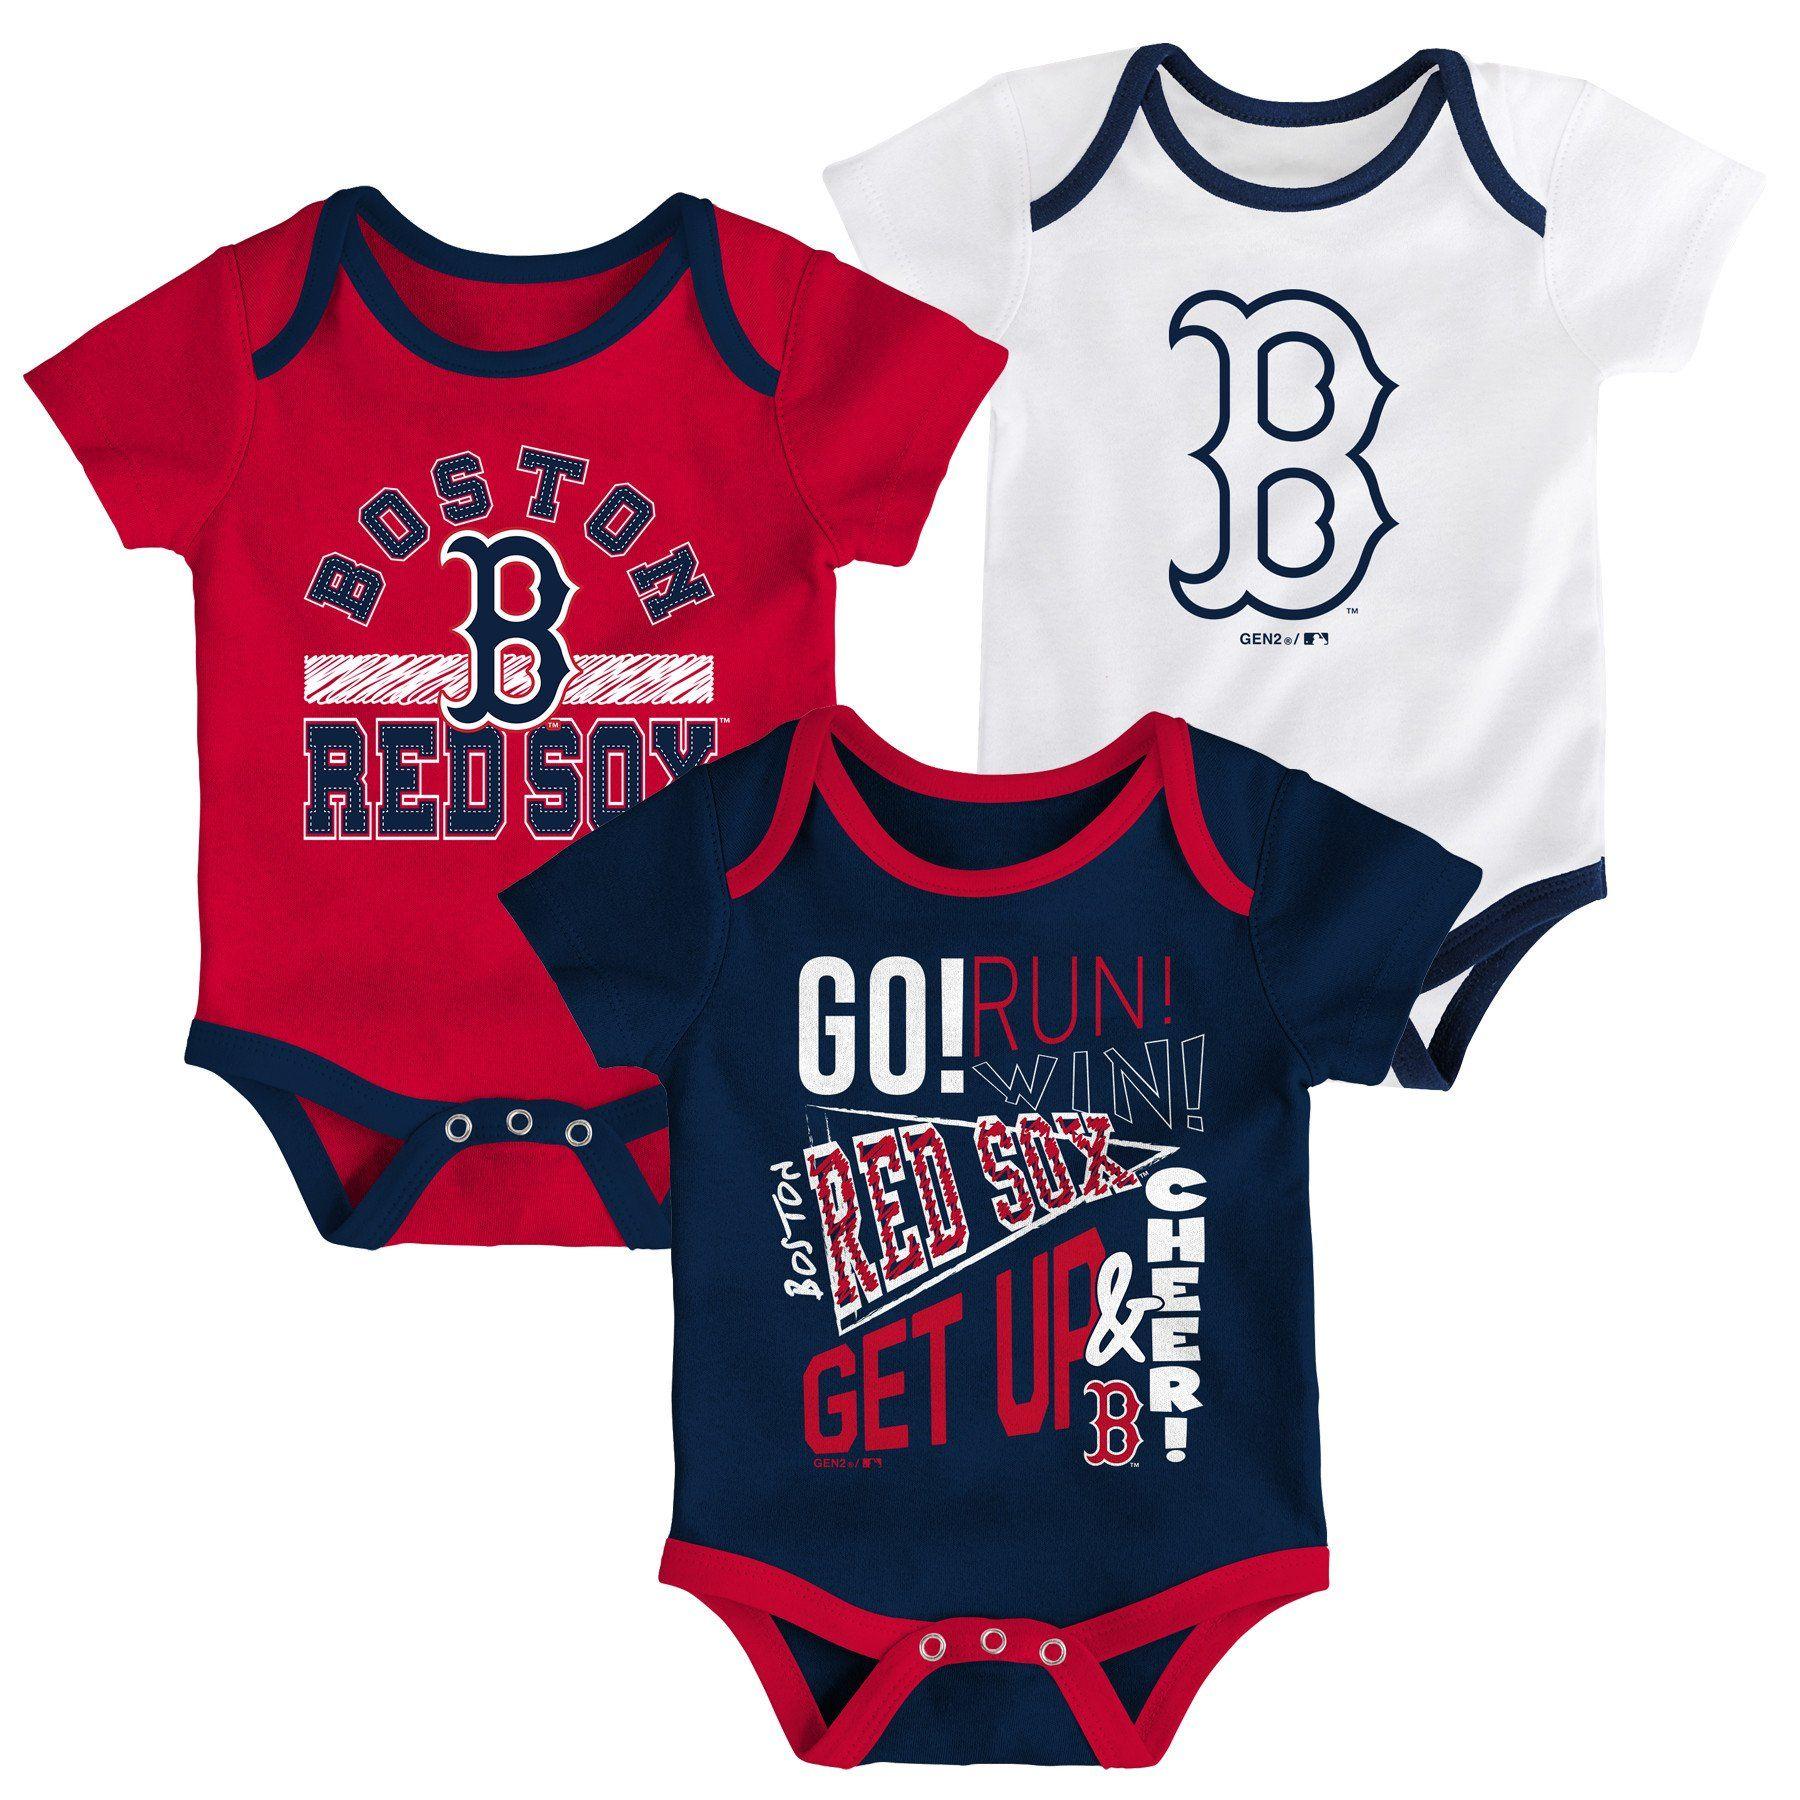 Outerstuff MLB Newborn Infants Play Ball 3 Piece Creeper Bodysuit Set